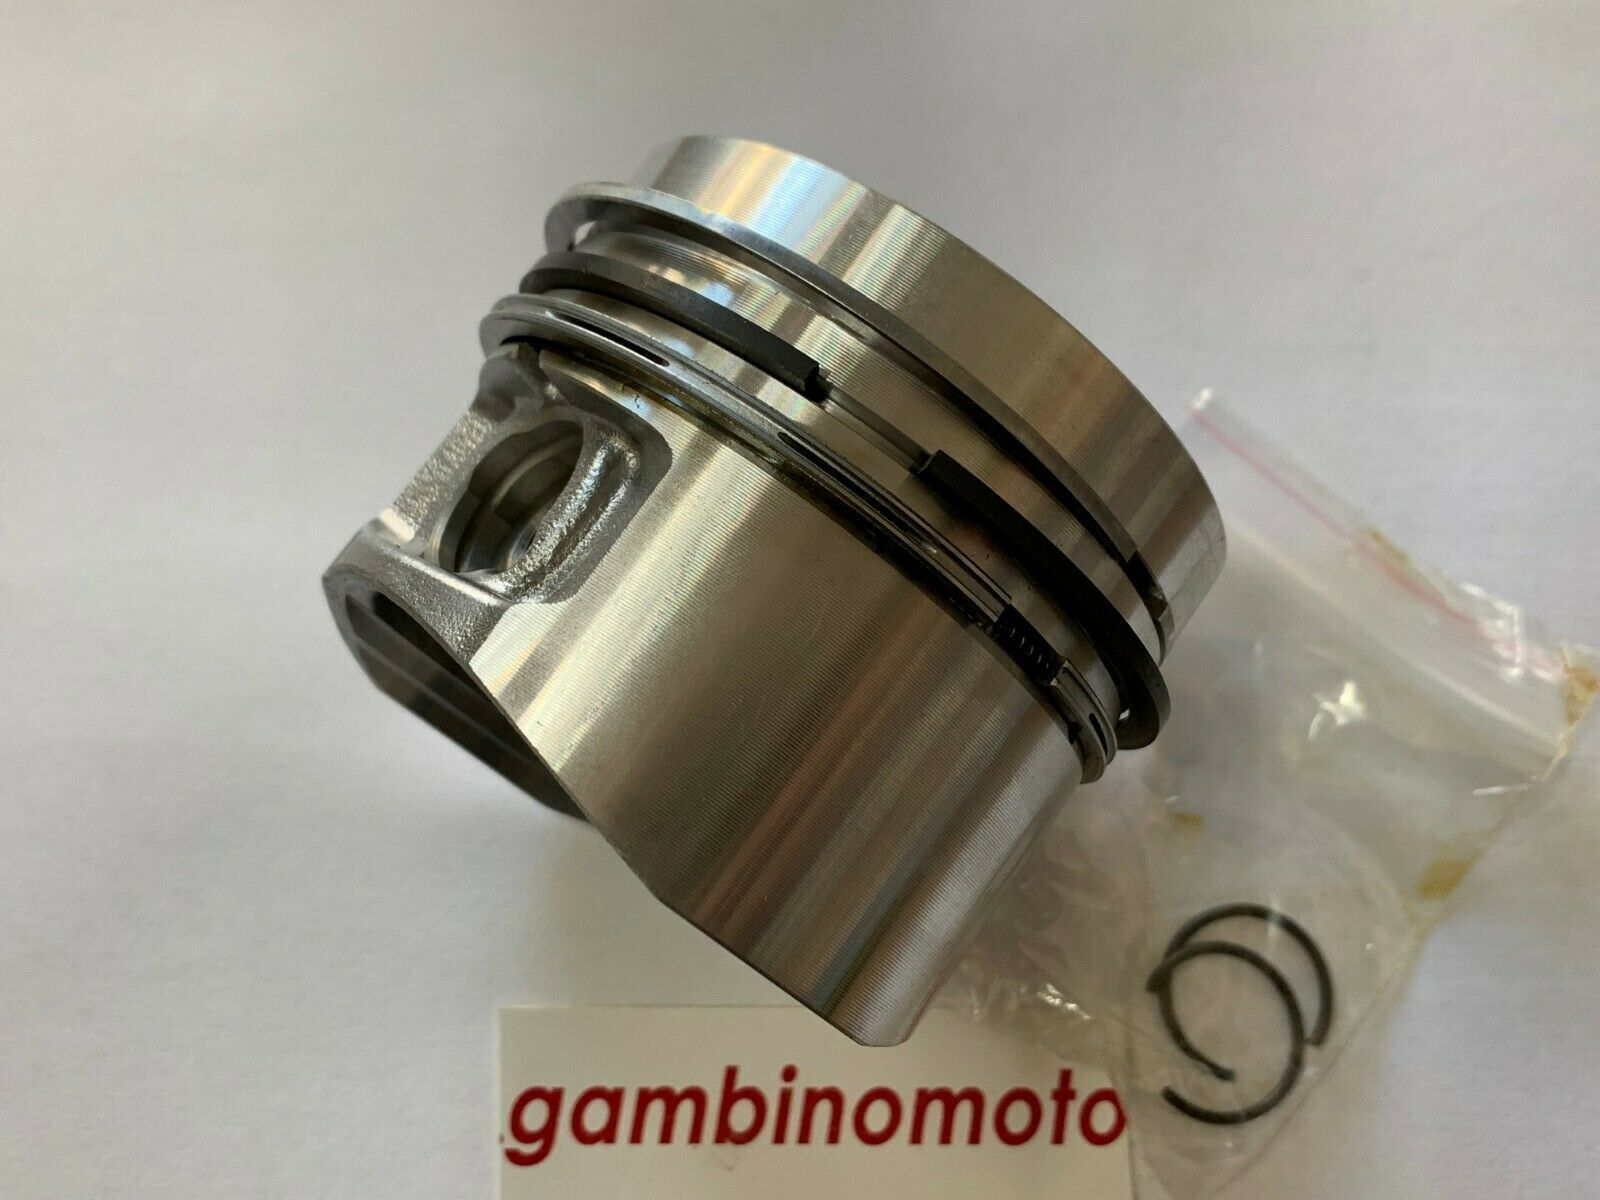 Pistón Motor Diesel Lombardini Ldw502 Ldw602 Ldw903 Ldw1204 Piaggio 75,50mm